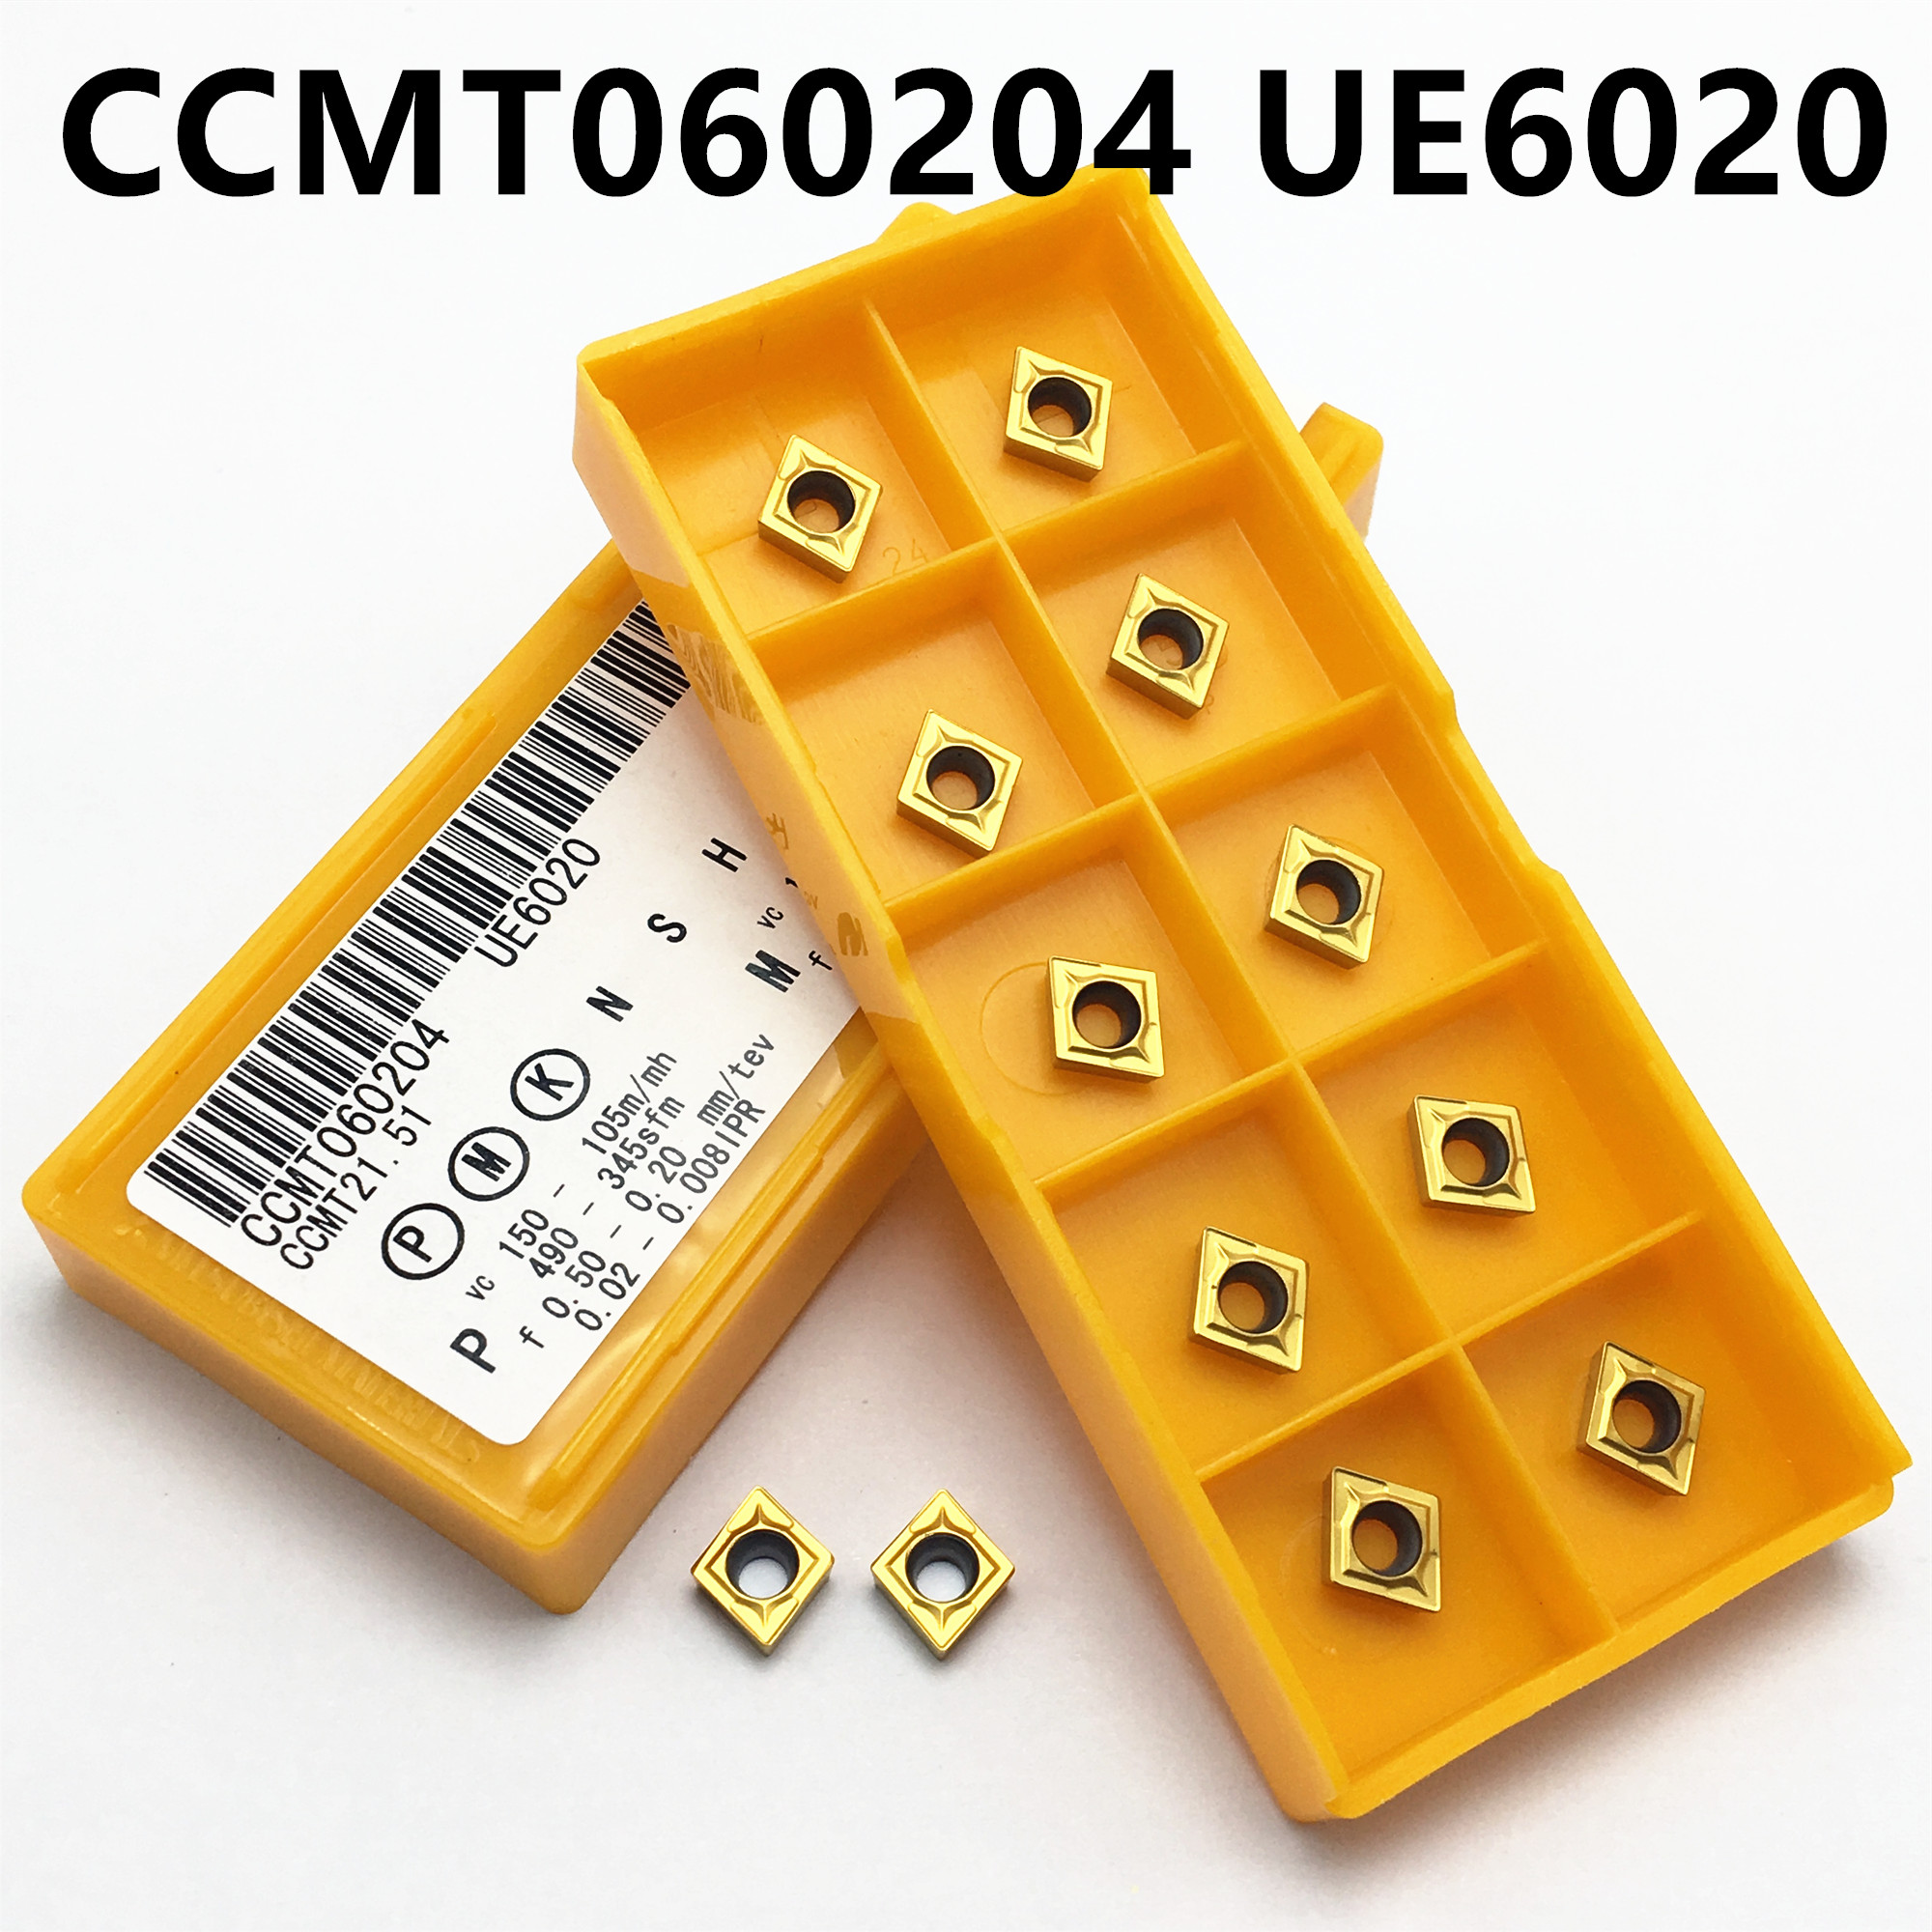 Carbide CCMT060204 VP15TF UE6020 US735 Internal Lathe Tool Milling Cutter Tungsten Carbide Ccmt 060204